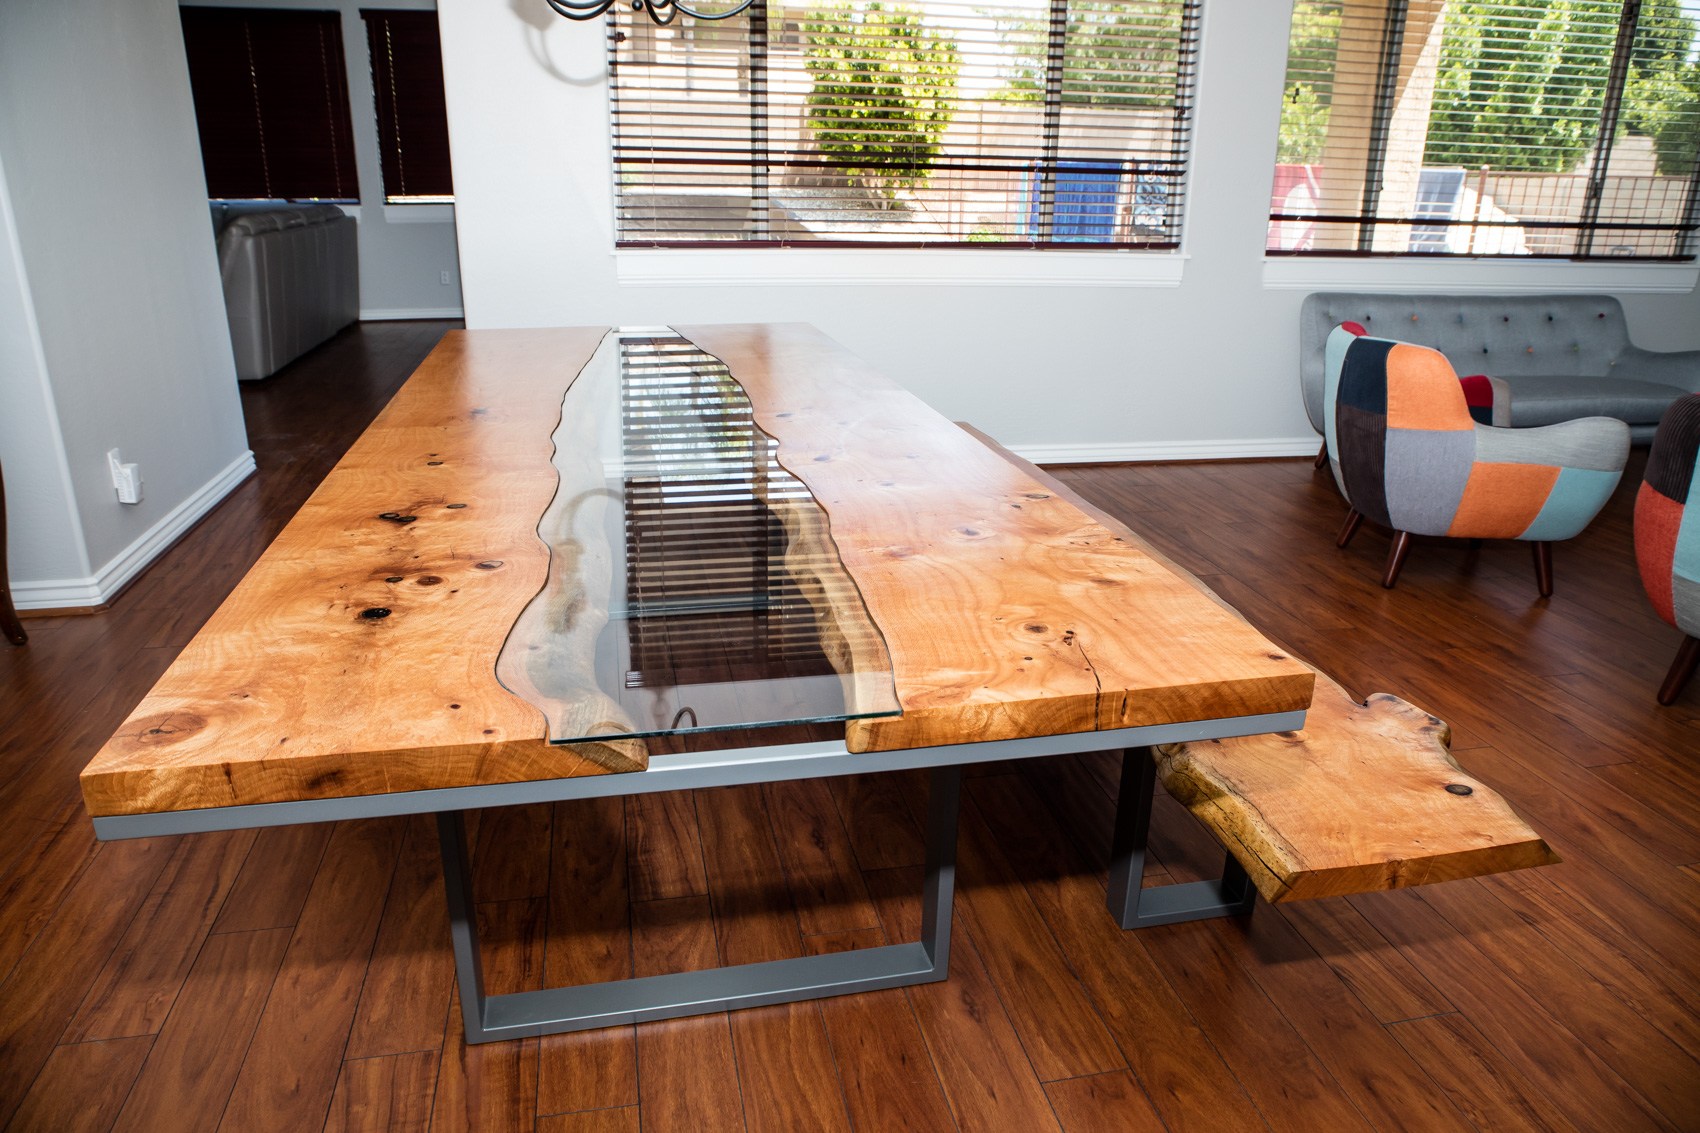 Silky Oak River Table Bench Build Lumberlust Designs